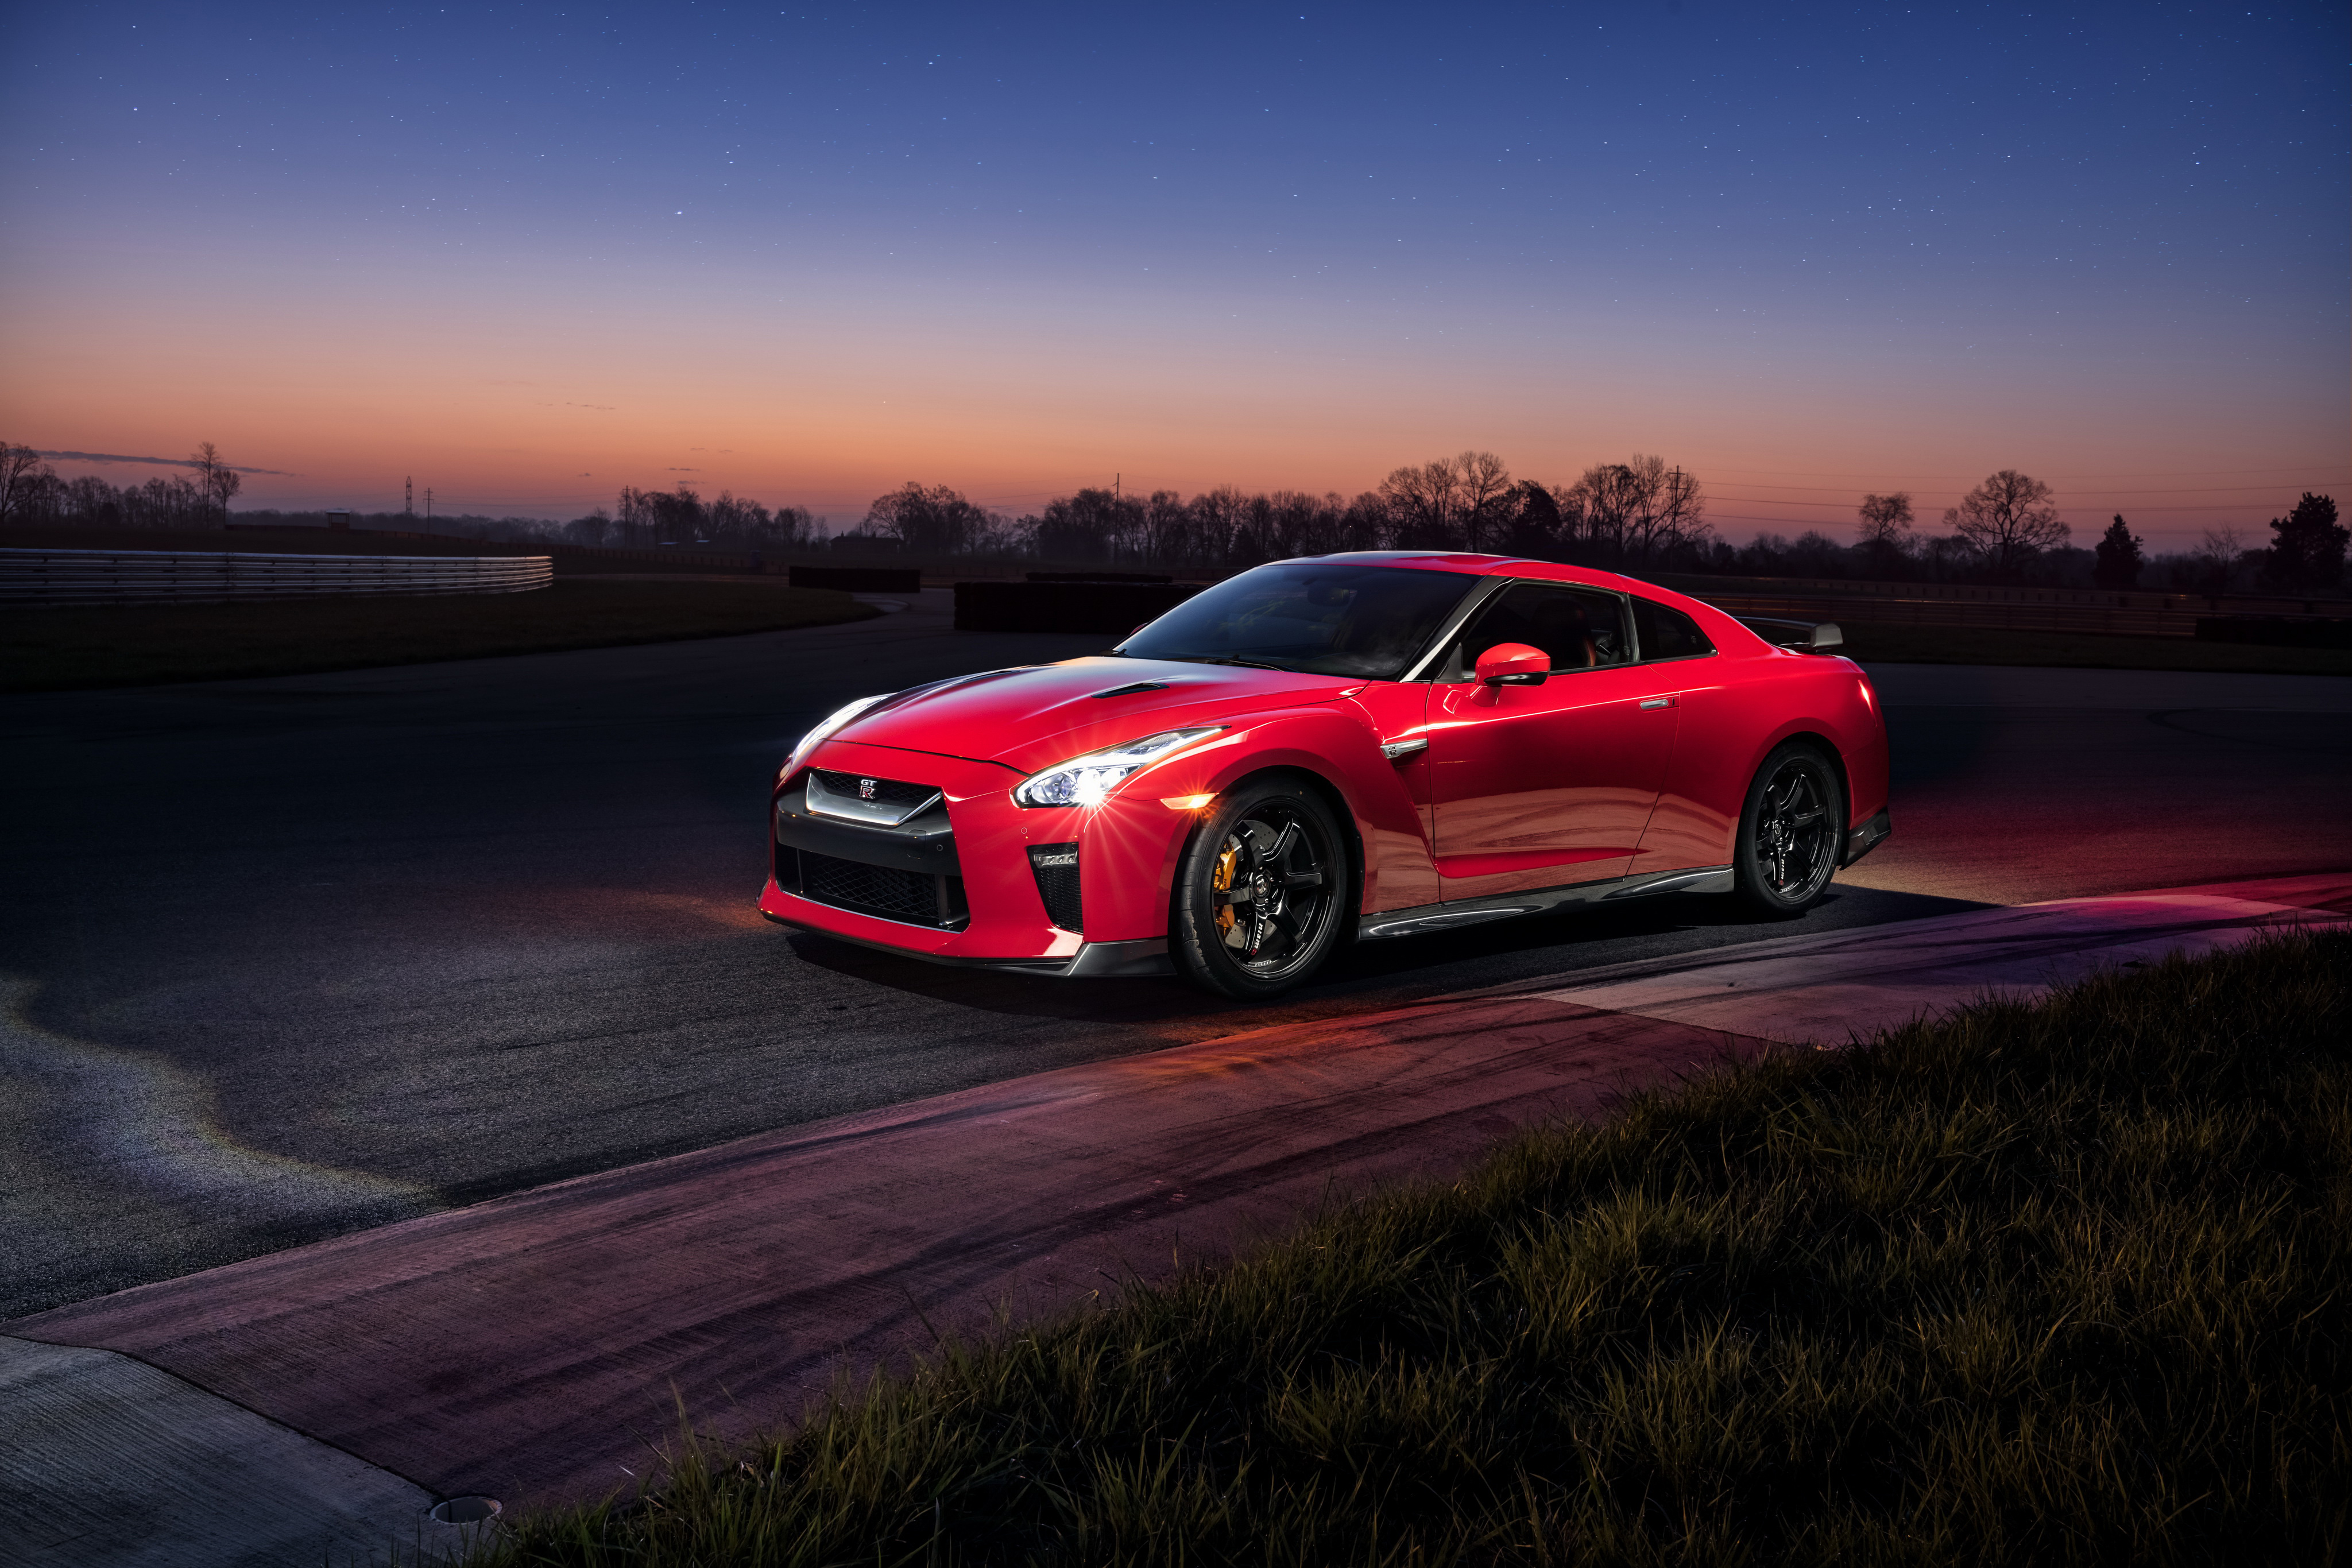 2017 nissan gtr track edition 1548528013 - 2017 Nissan GTR Track Edition - nissan wallpapers, nissan gtr wallpapers, hd-wallpapers, cars wallpapers, 4k-wallpapers, 2017 cars wallpapers